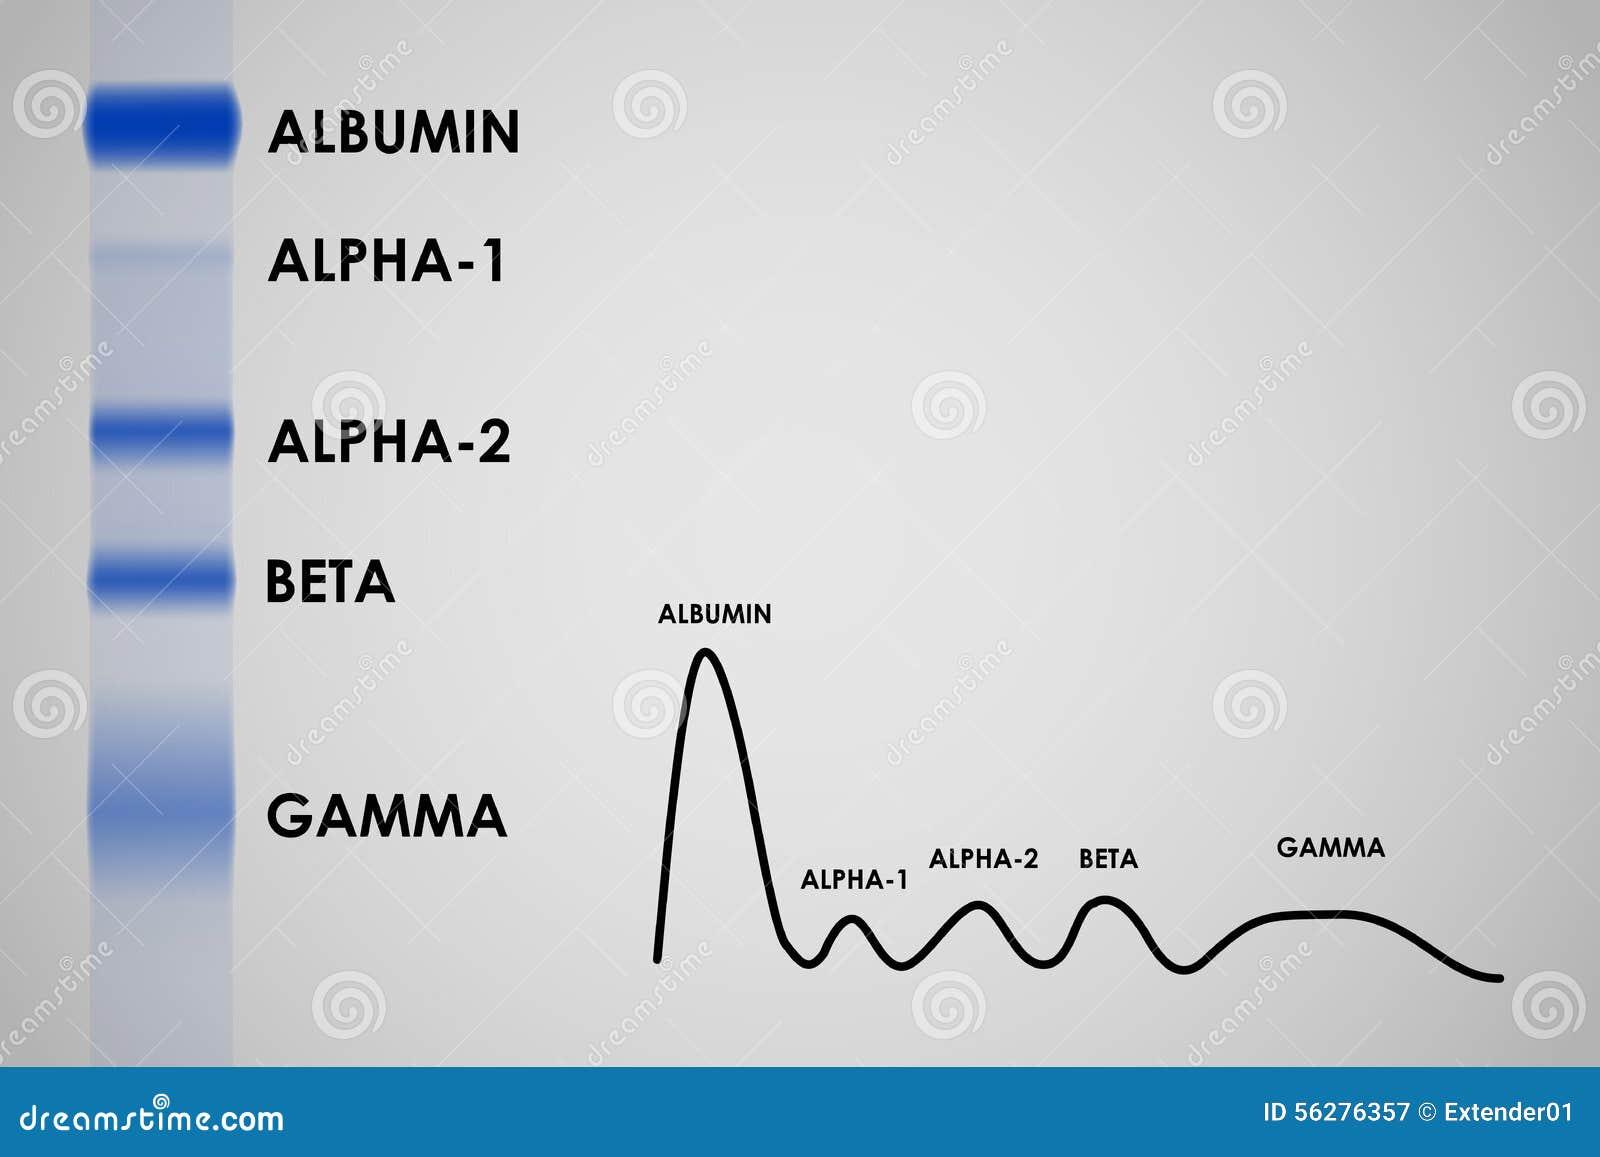 Blood Serum Protein Electrophoresis Stock Vector - Image: 56276357